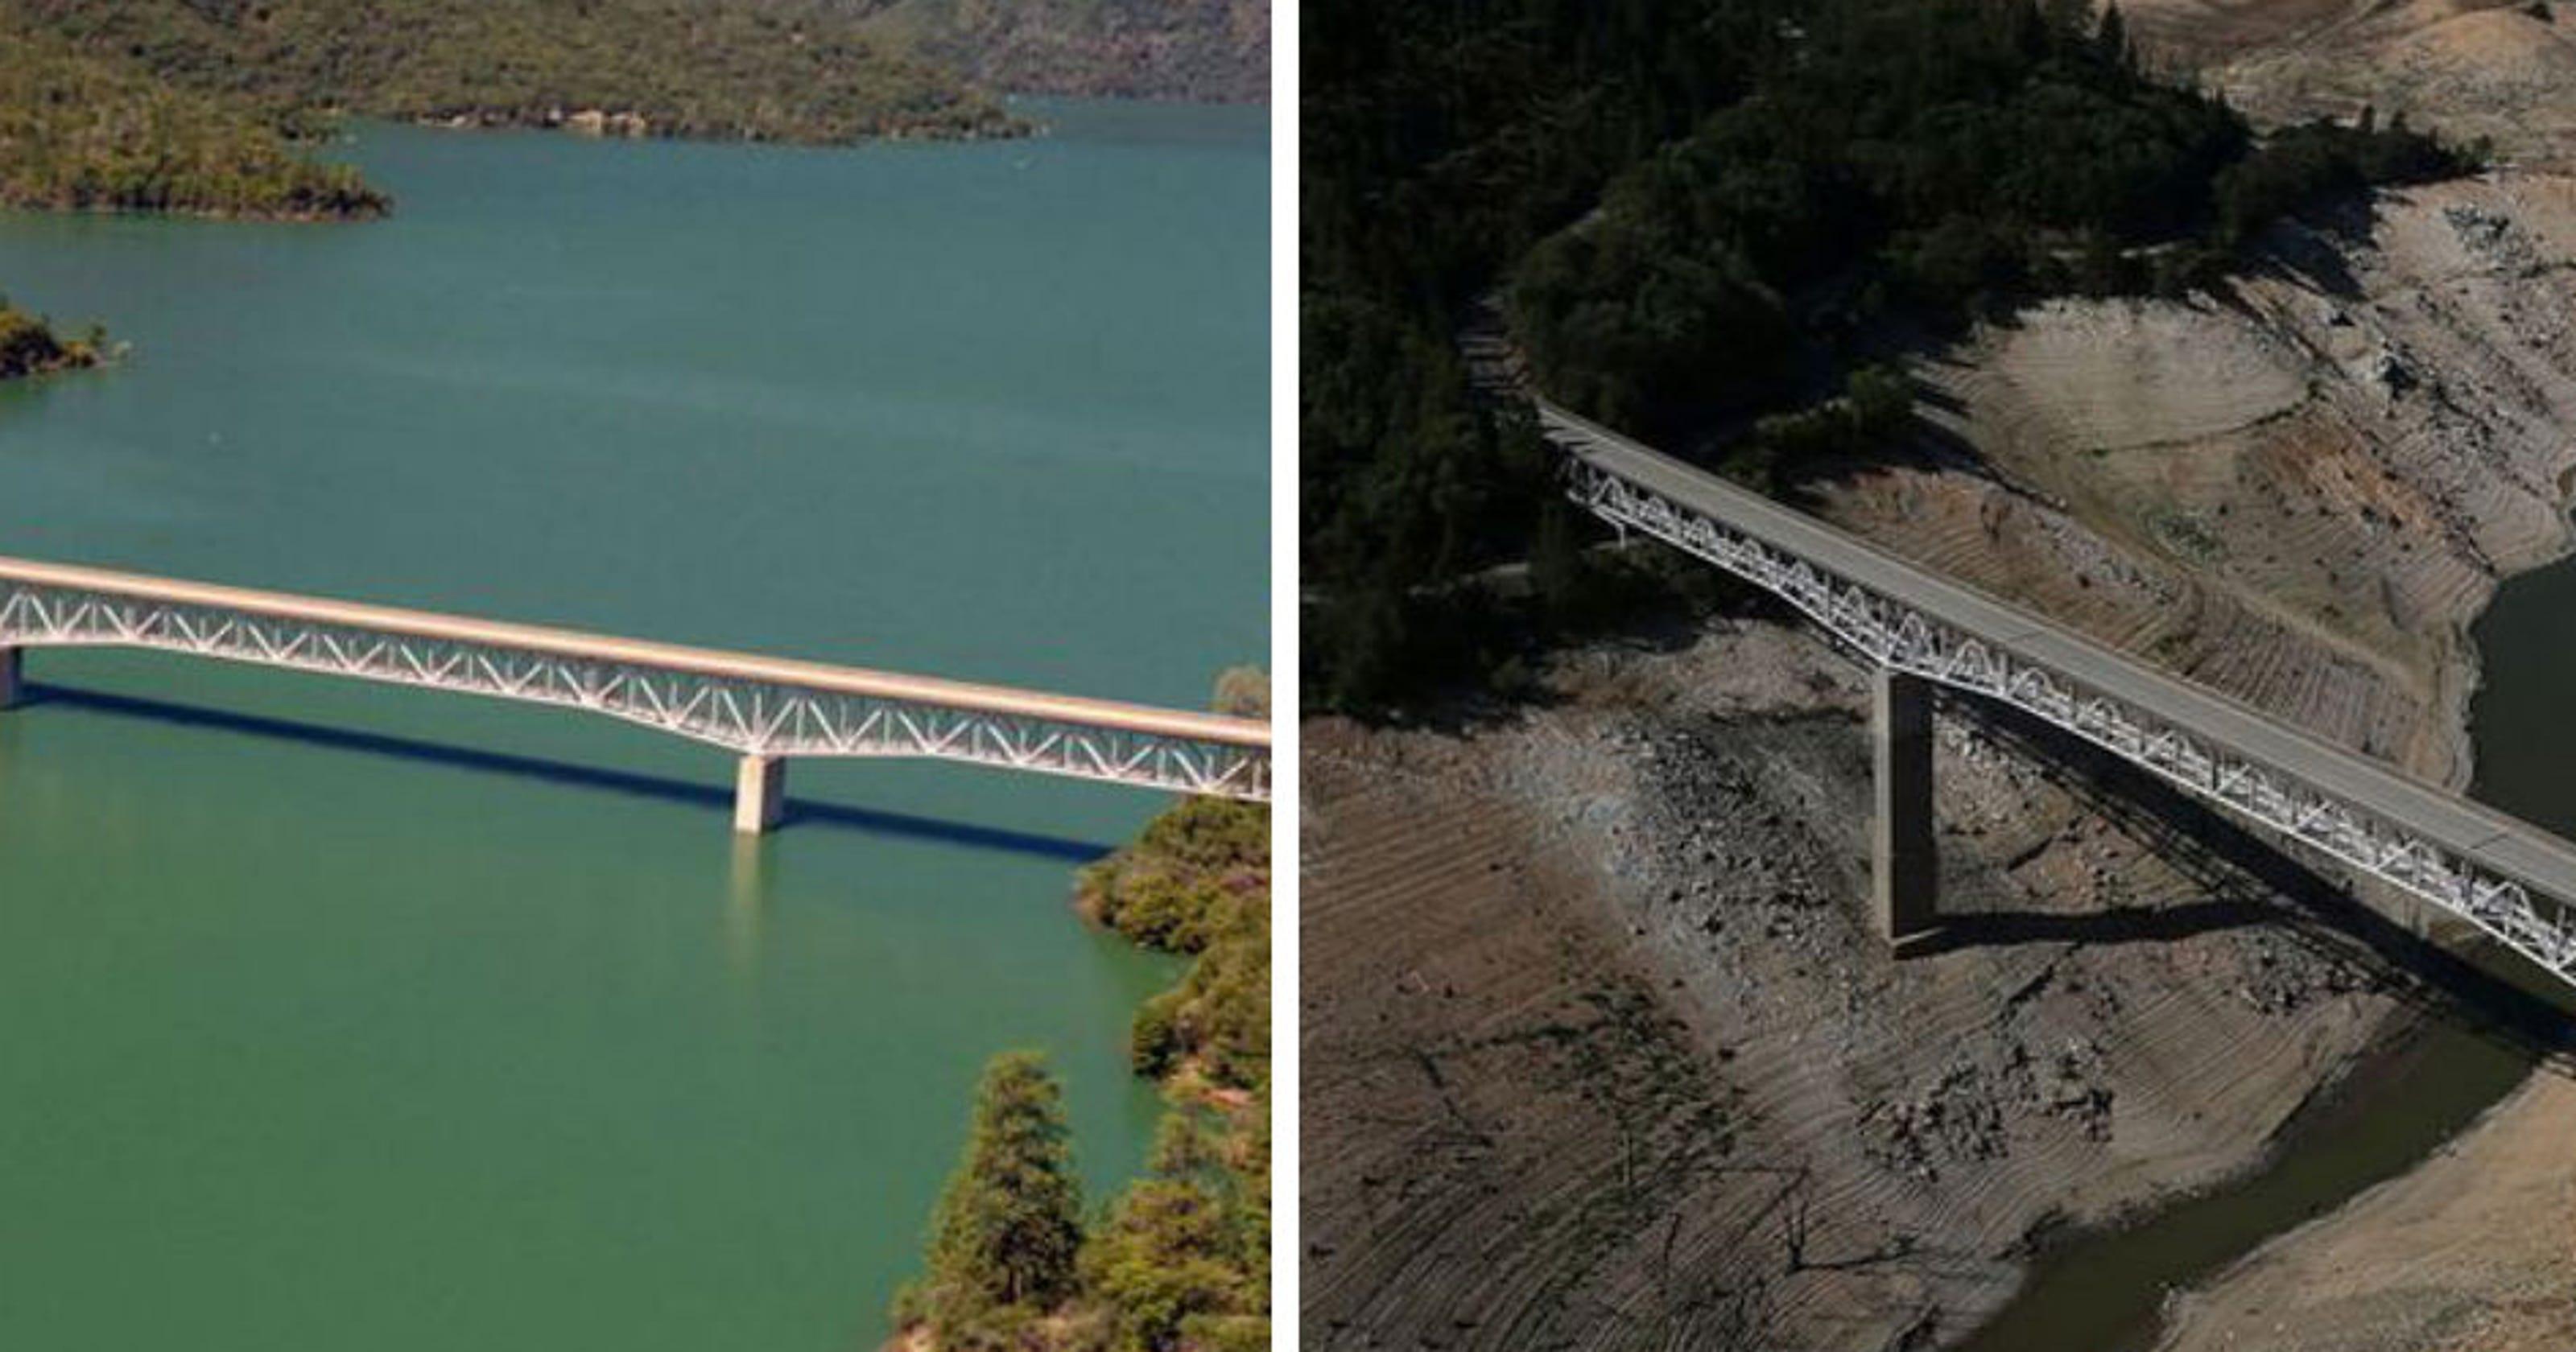 California's 100-year drought